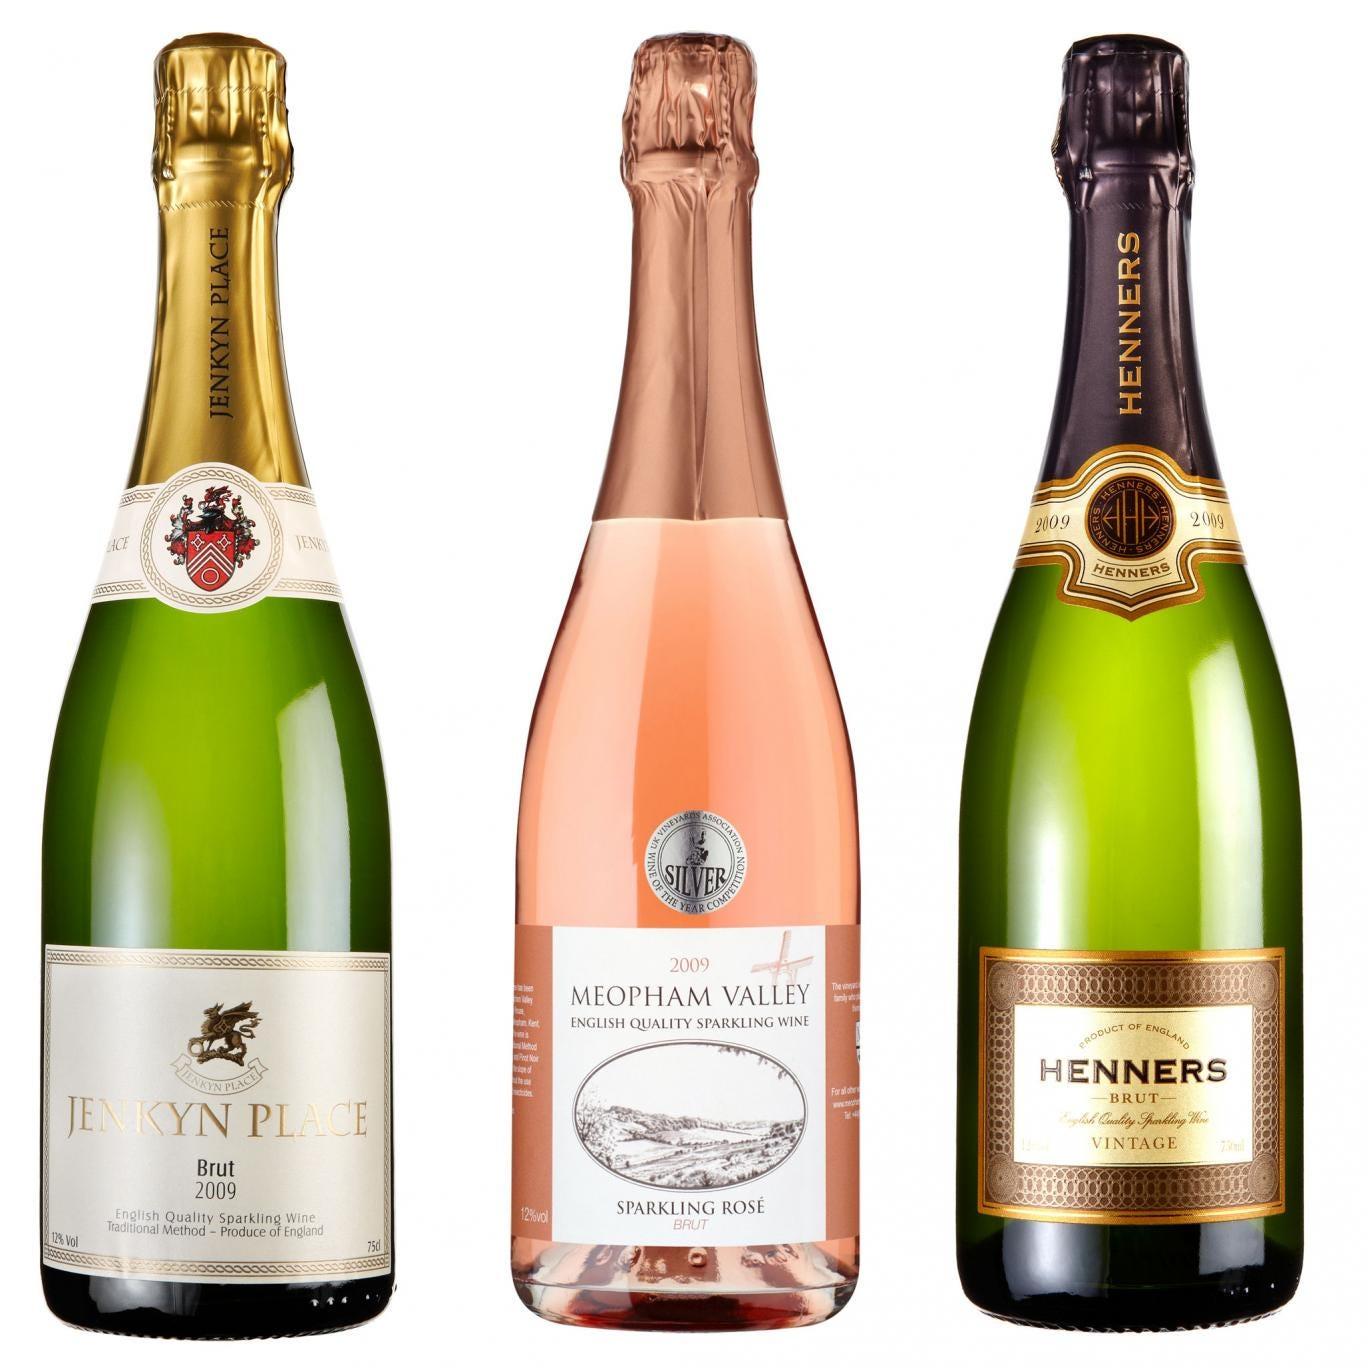 Jenkyn Place Brut 2009; Meopham Valley Rosé 2009; Henners Brut 2009